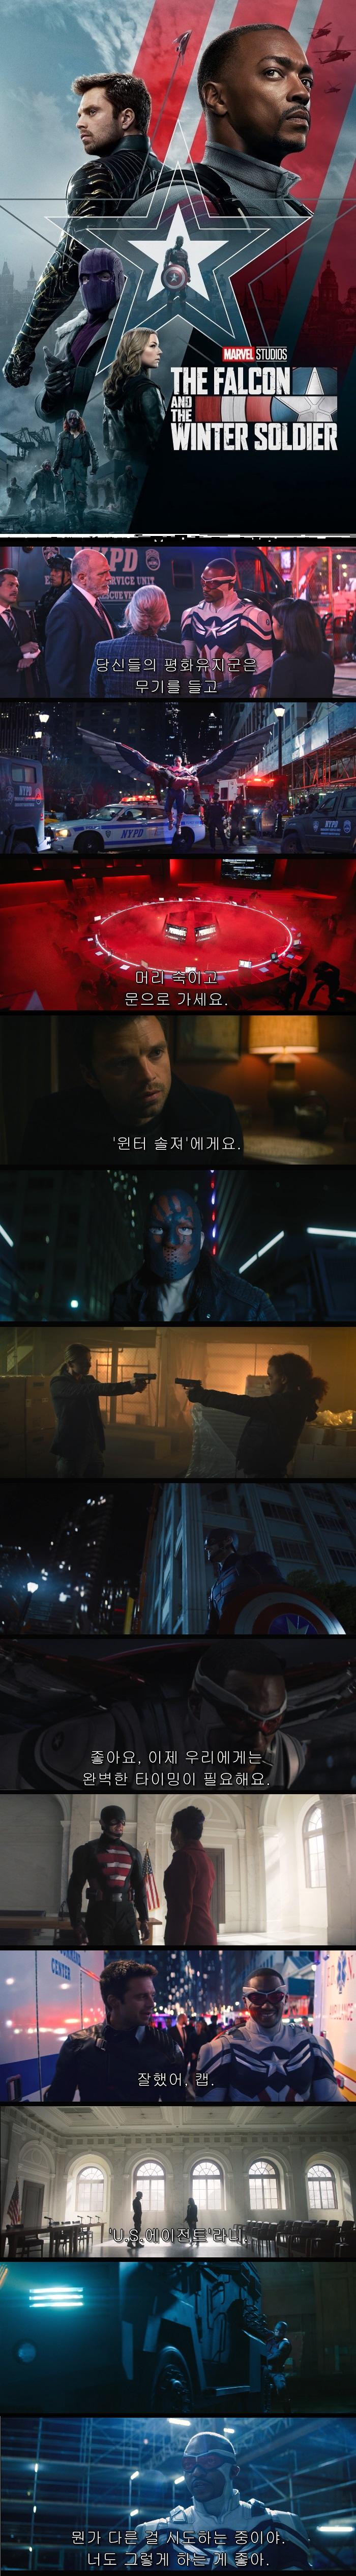 <b>2O21 먀블 신작 [ 히어로 대결 ] 여섯번째 이야기 (초고화질 한글자막)</b>